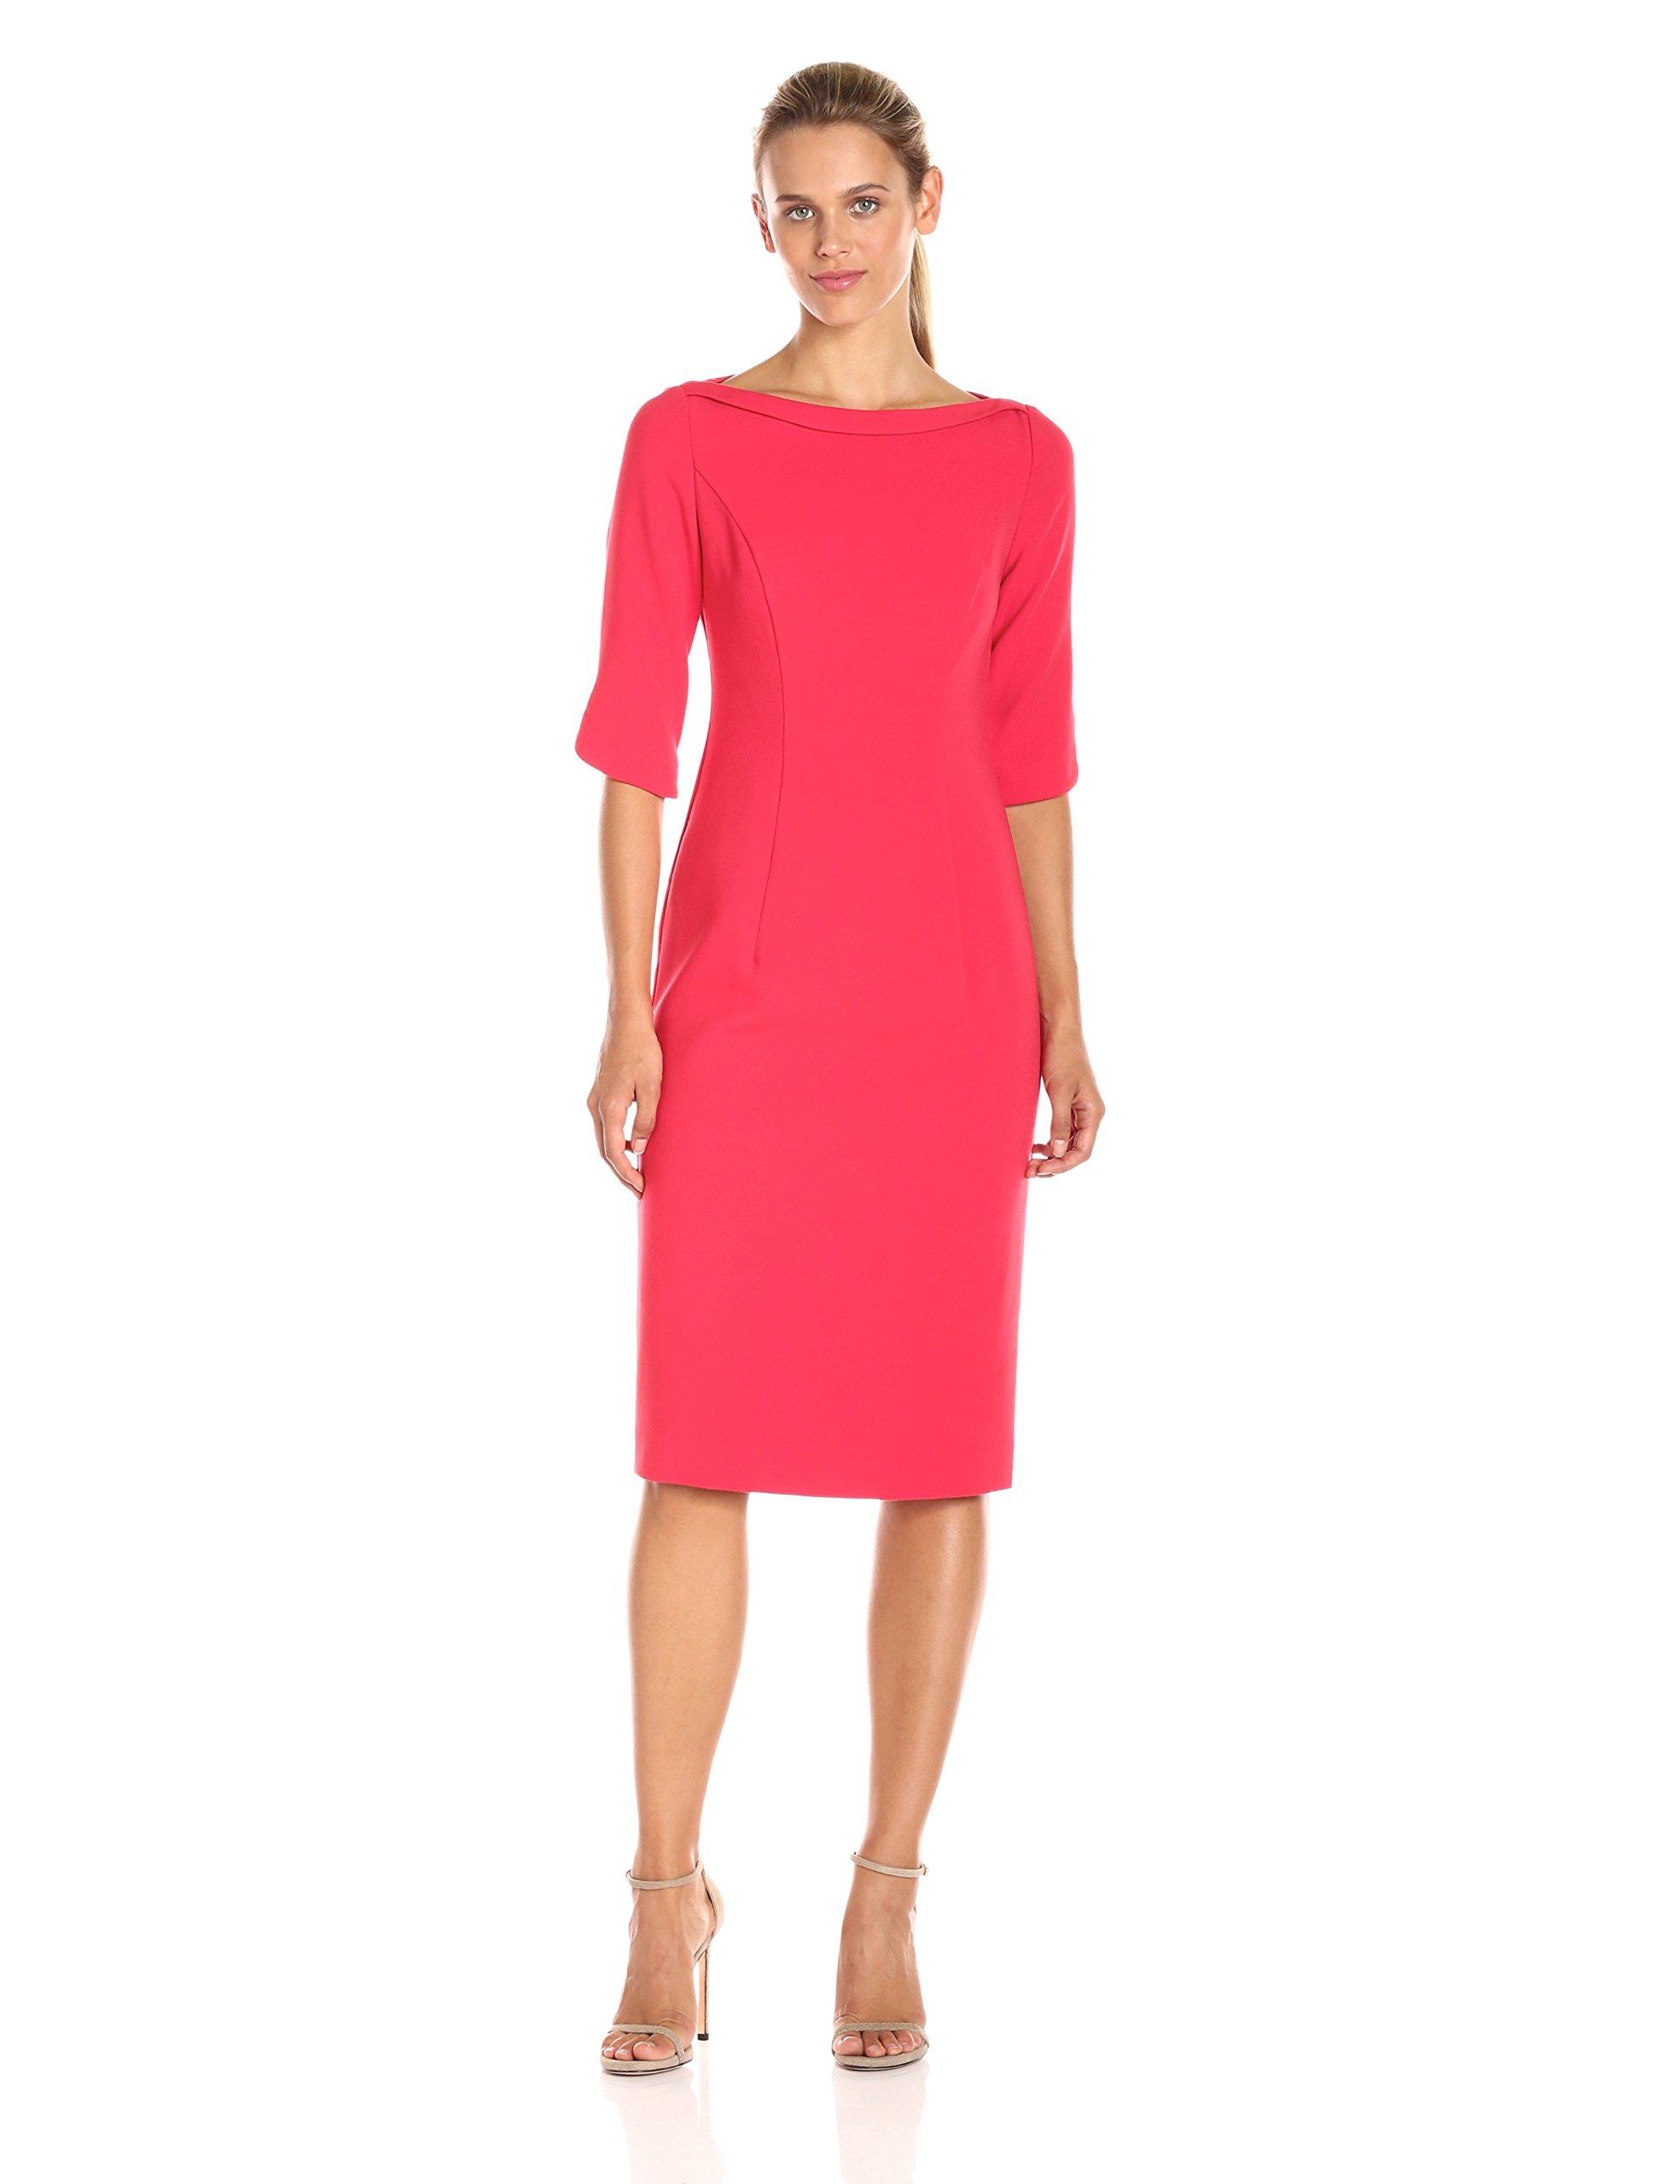 Black Halo Women's Nuelle 3/4 Slv Sheath Dress, Chic Red, 4